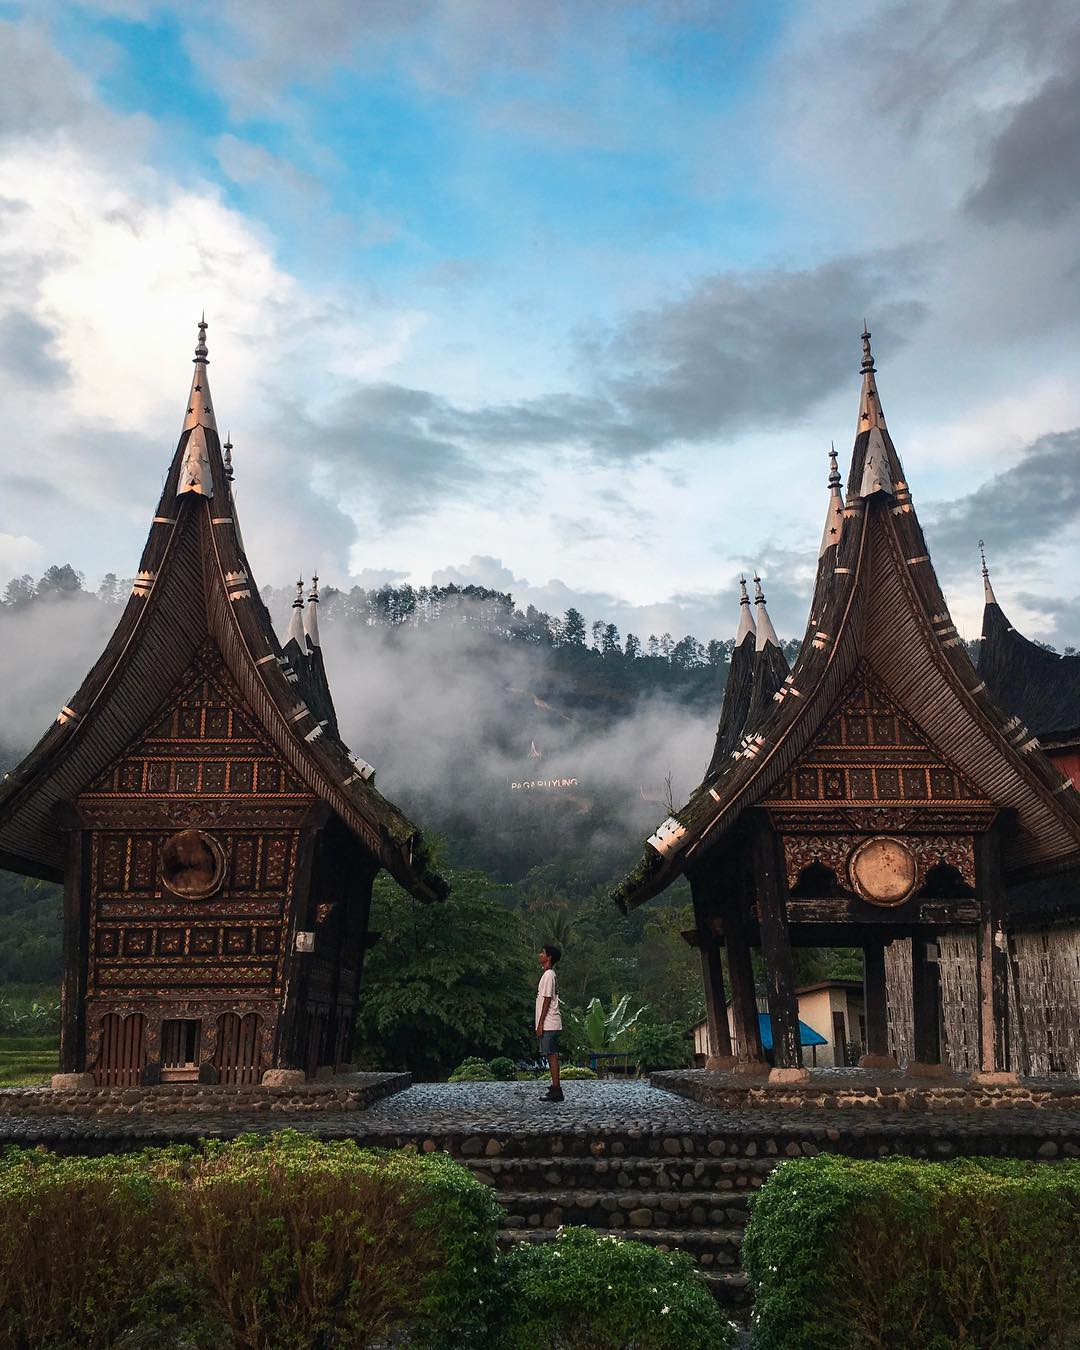 Istana Pagaruyung Keindahan Peninggalan Kerajaan Pagaruyung Destinasi Travel Indonesia